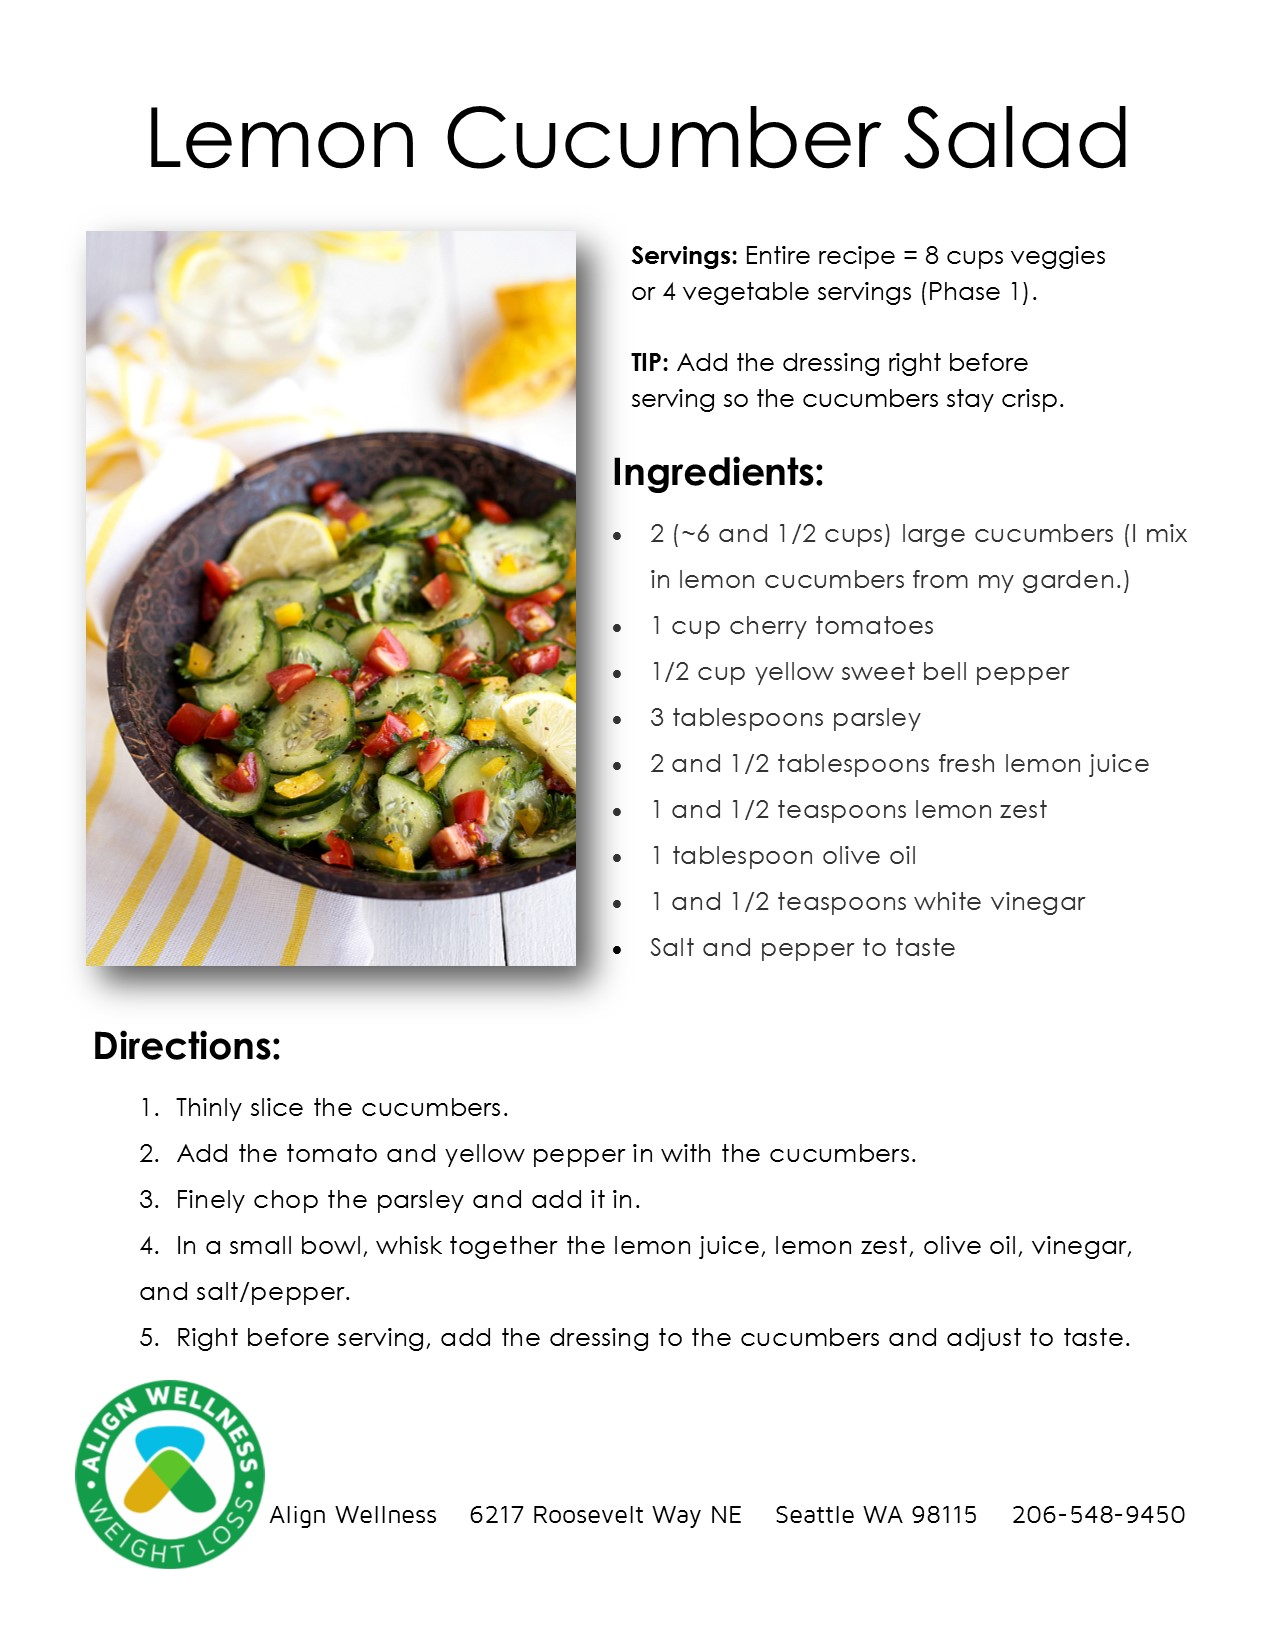 Lemon Cucumber Salad Ideal Protein Recipe